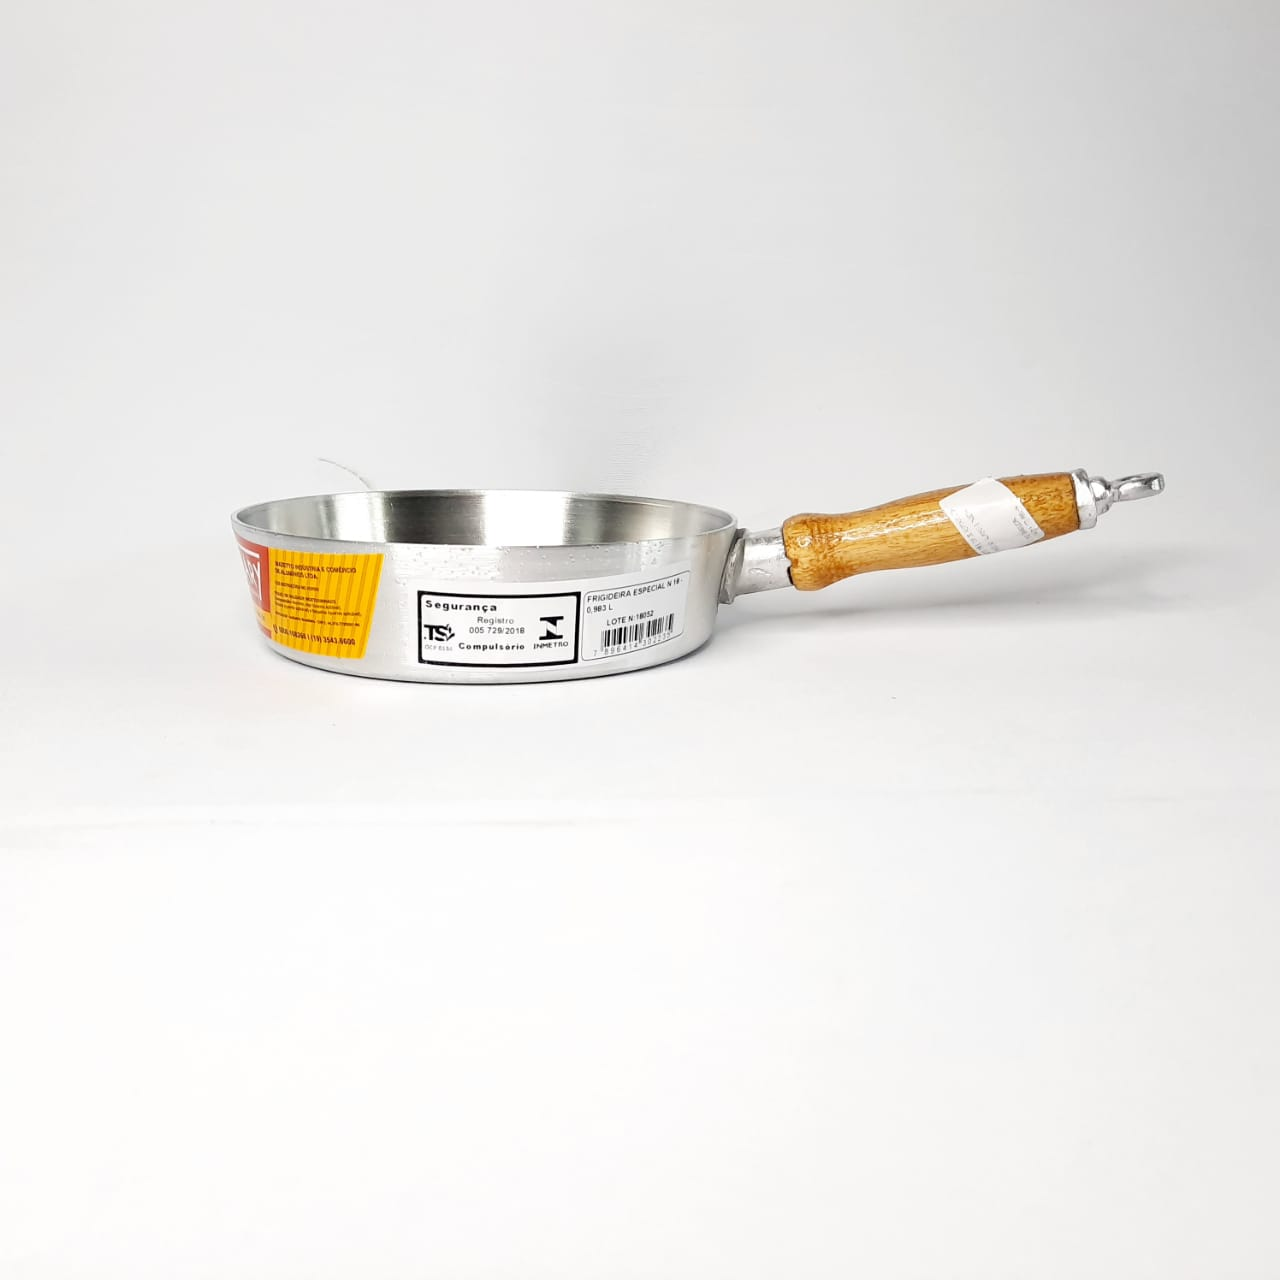 Frigideira Alumínio Fundido N 18  0,93 Litros Arary